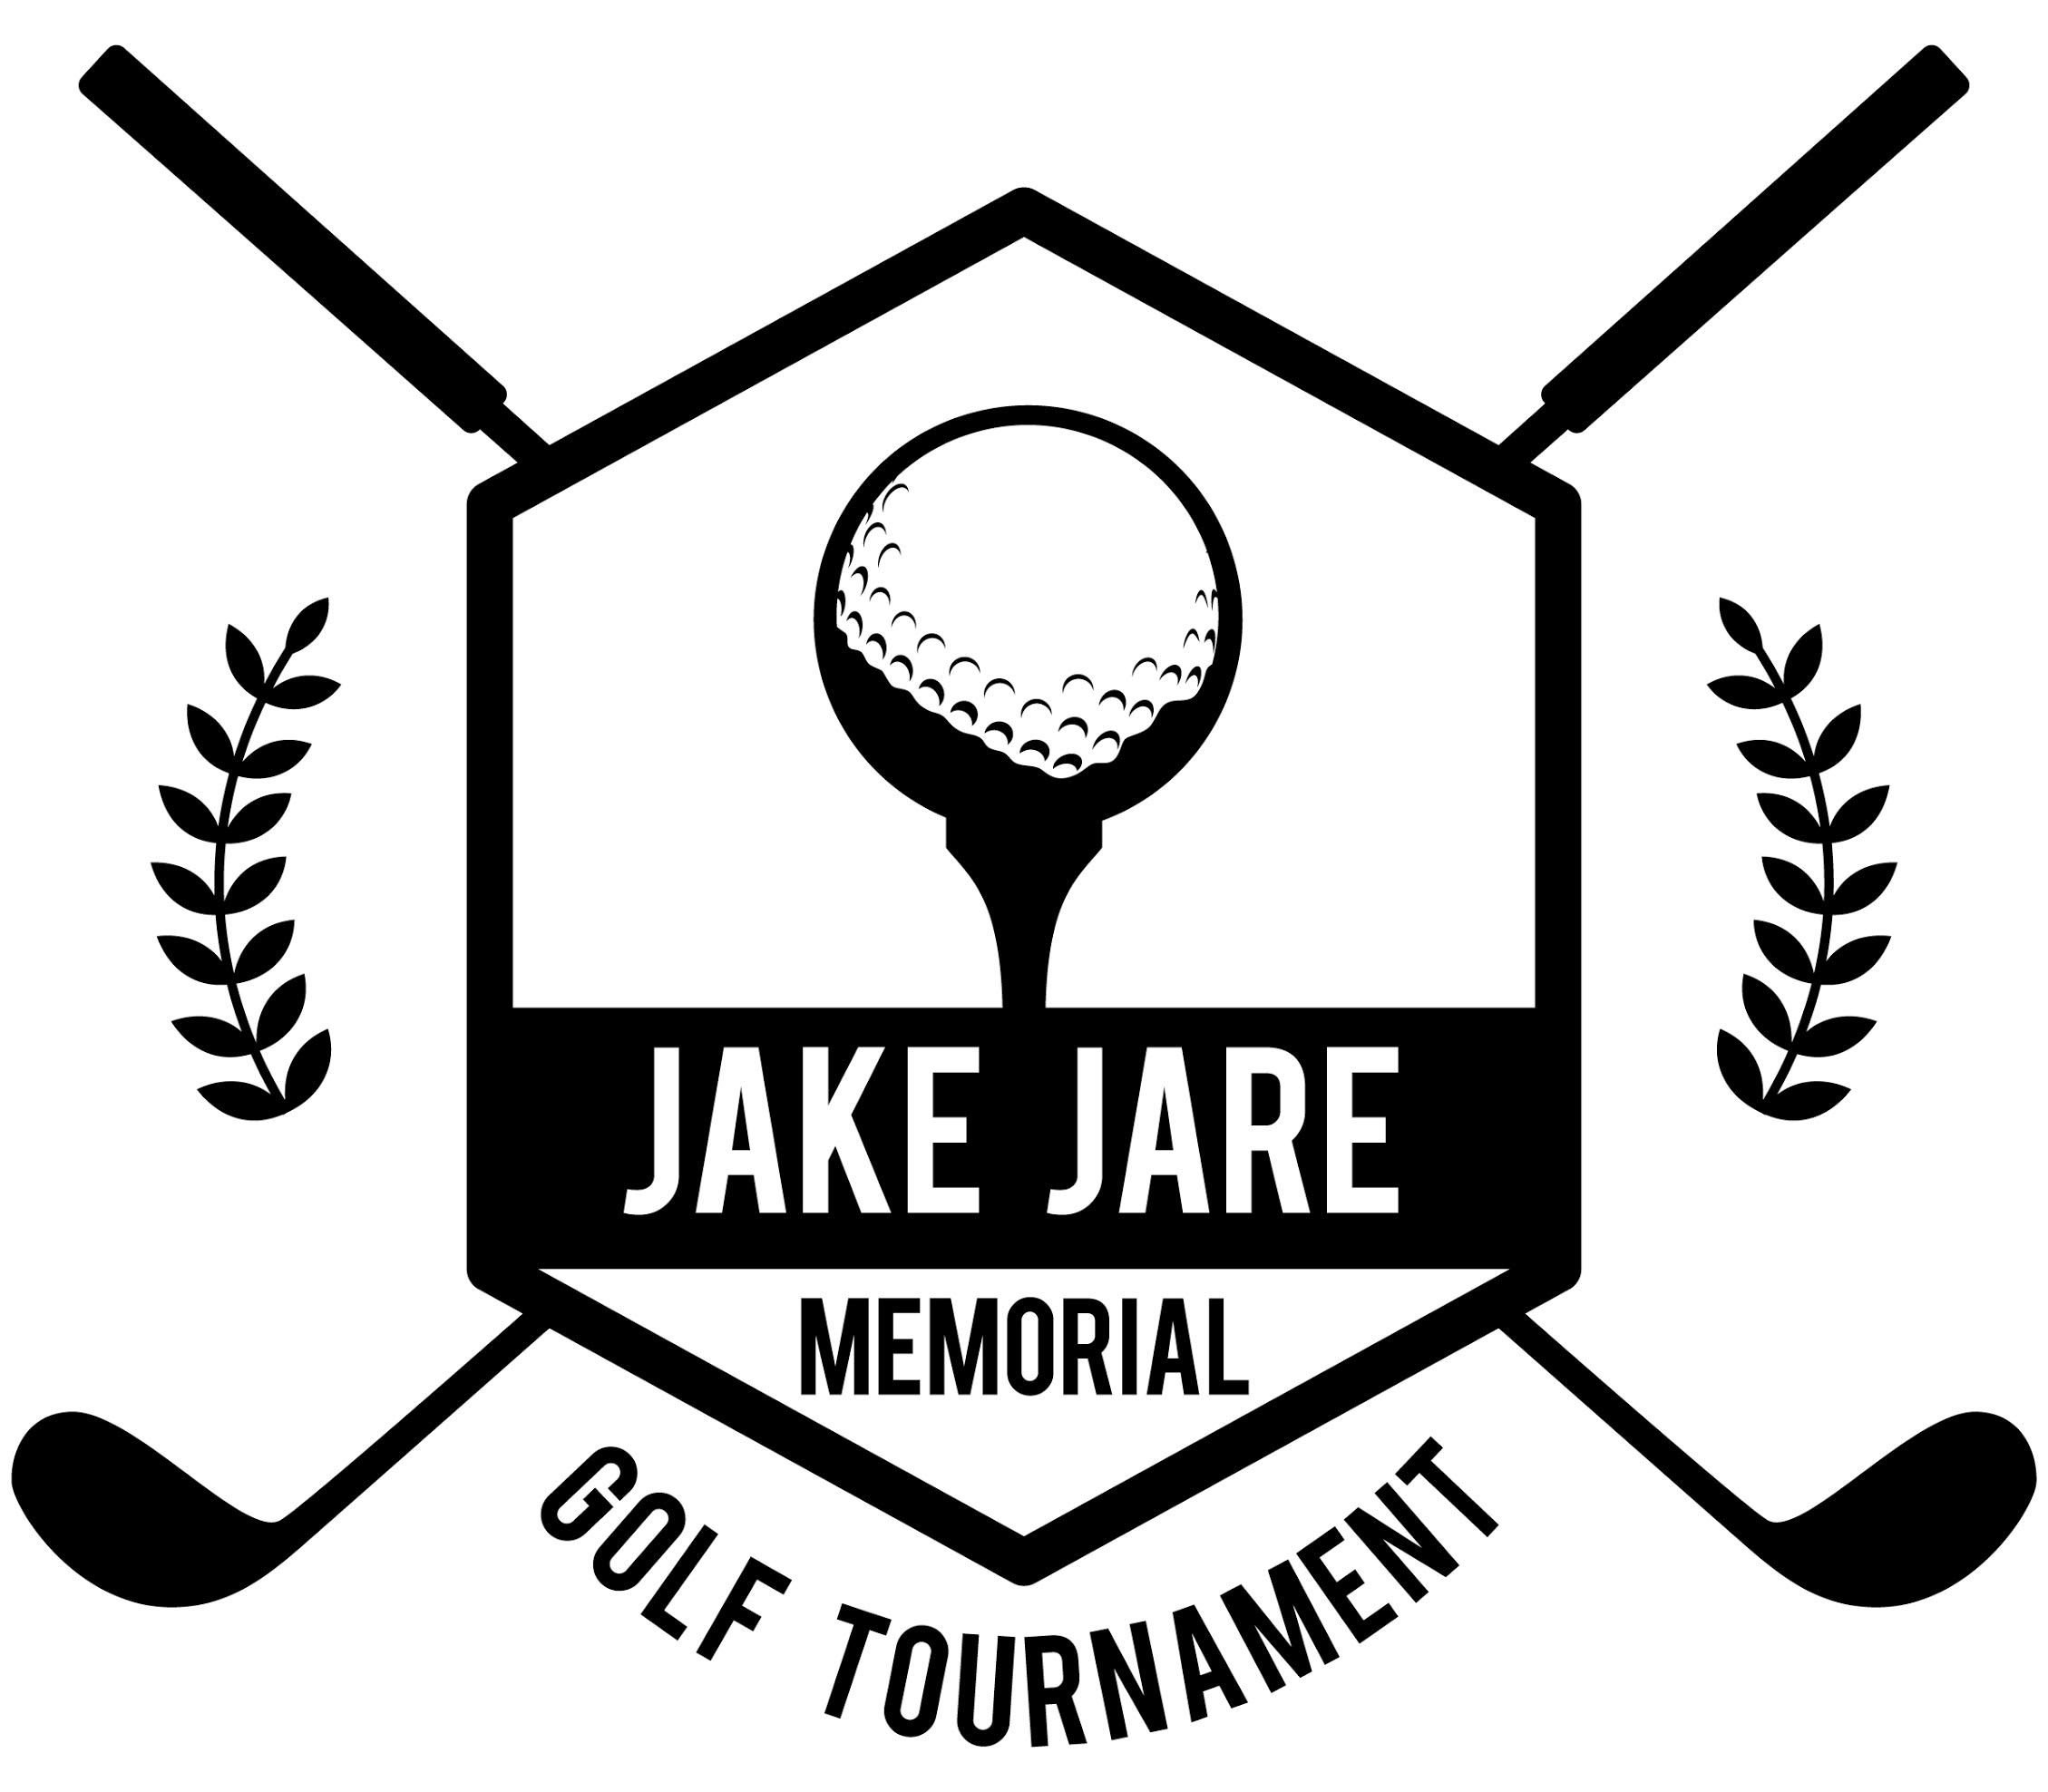 Jake Jare Memorial Golf Tournamnet logo